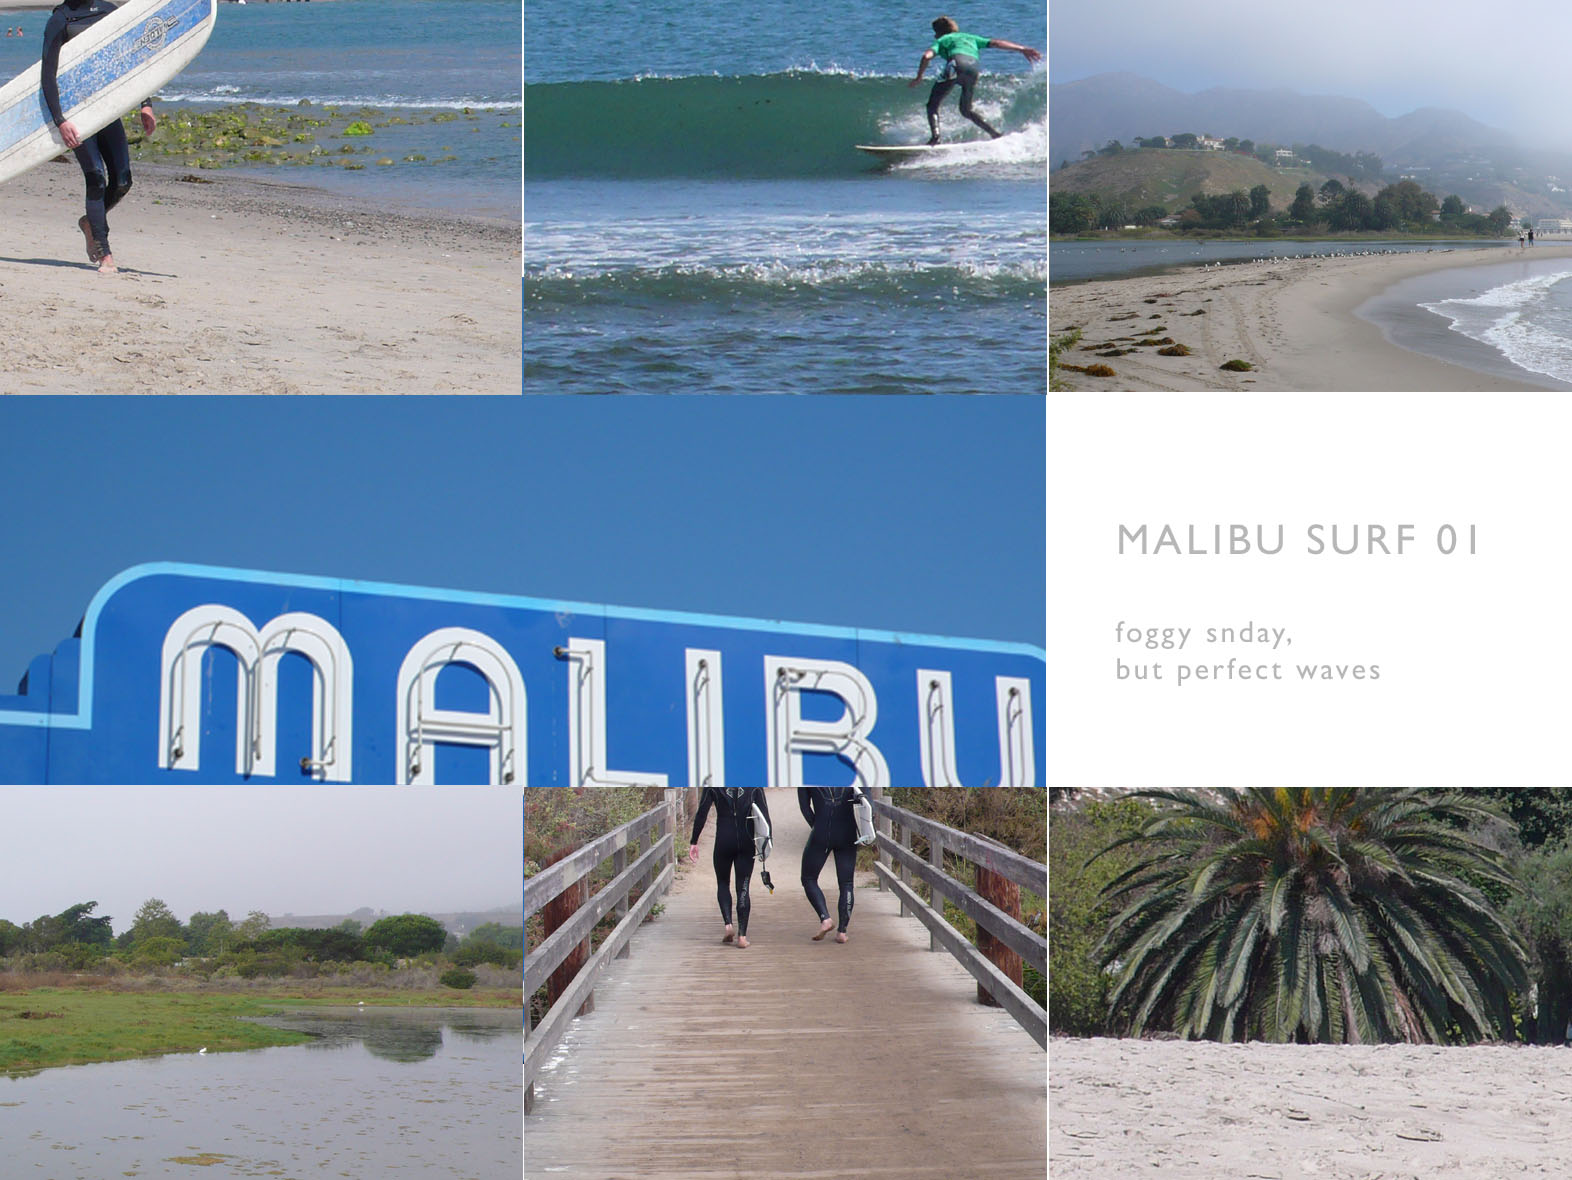 malibusurf01